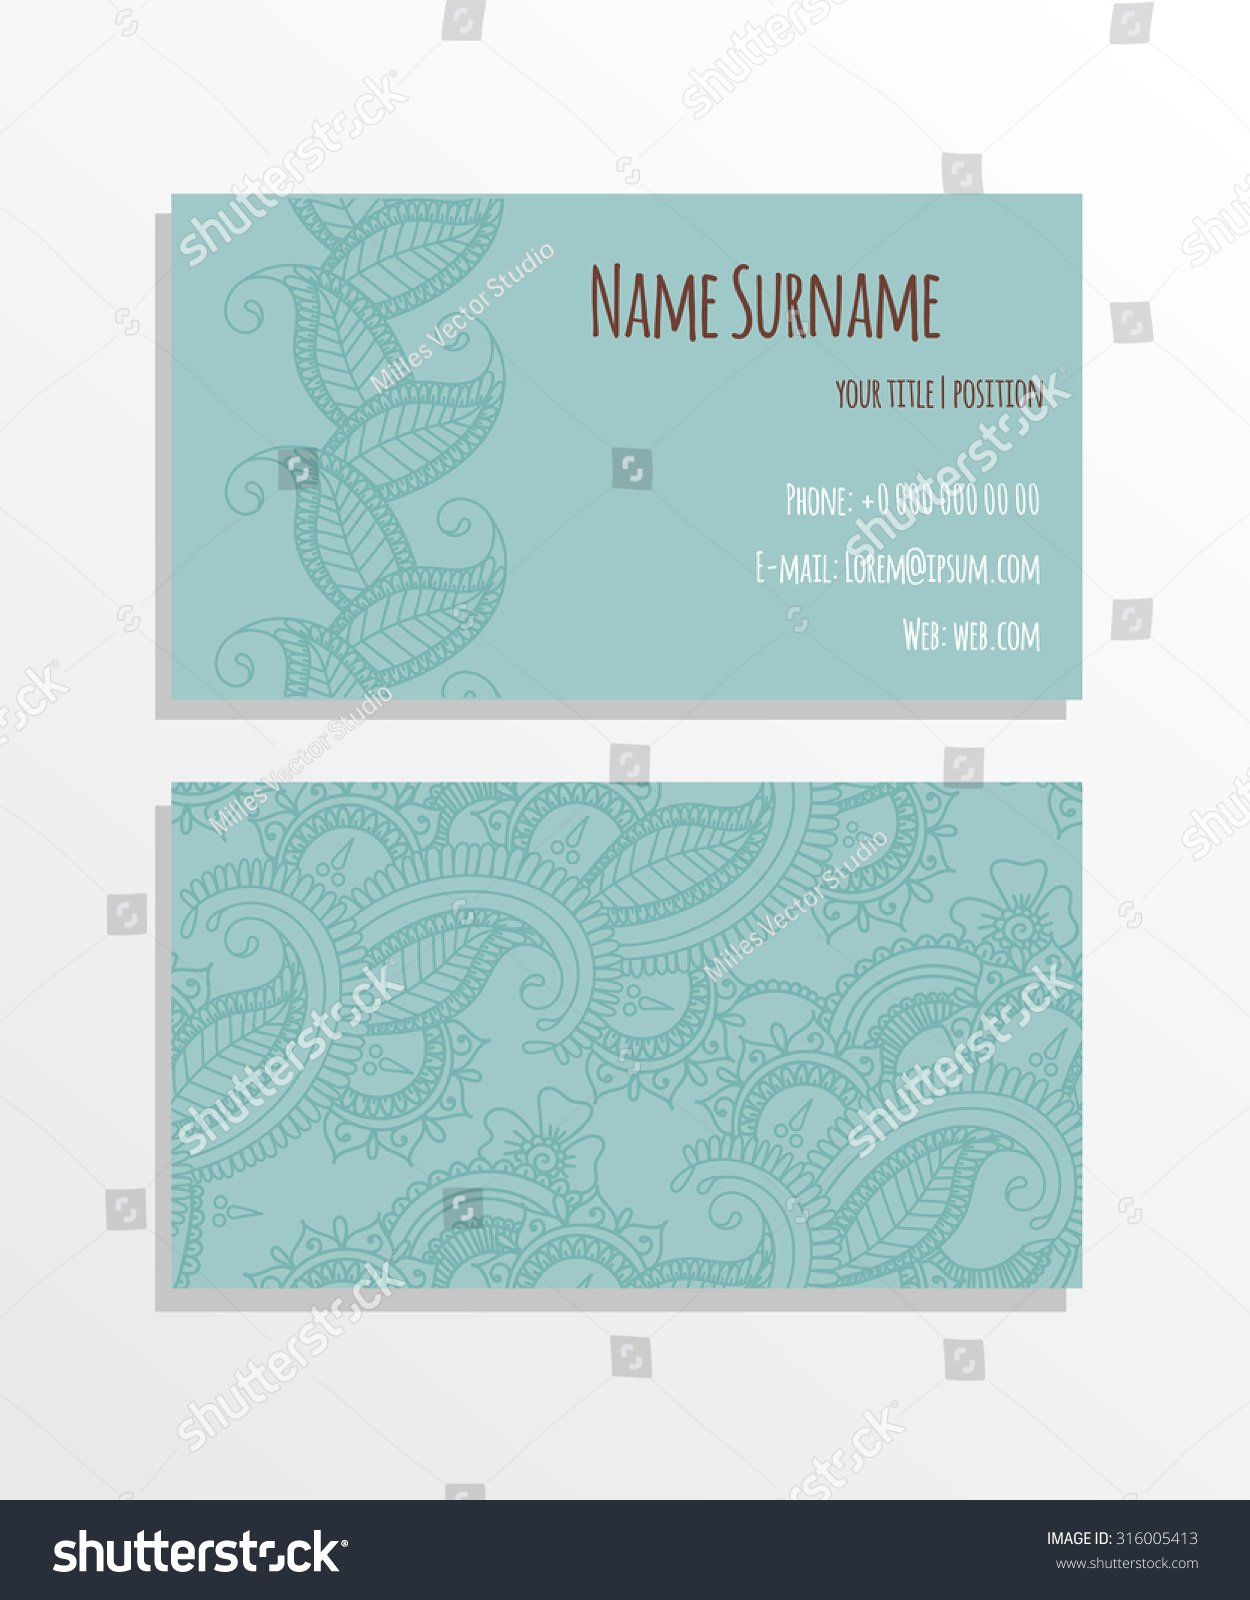 Paisley business card design vector illustration stock vector paisley business card design vector illustration magicingreecefo Images